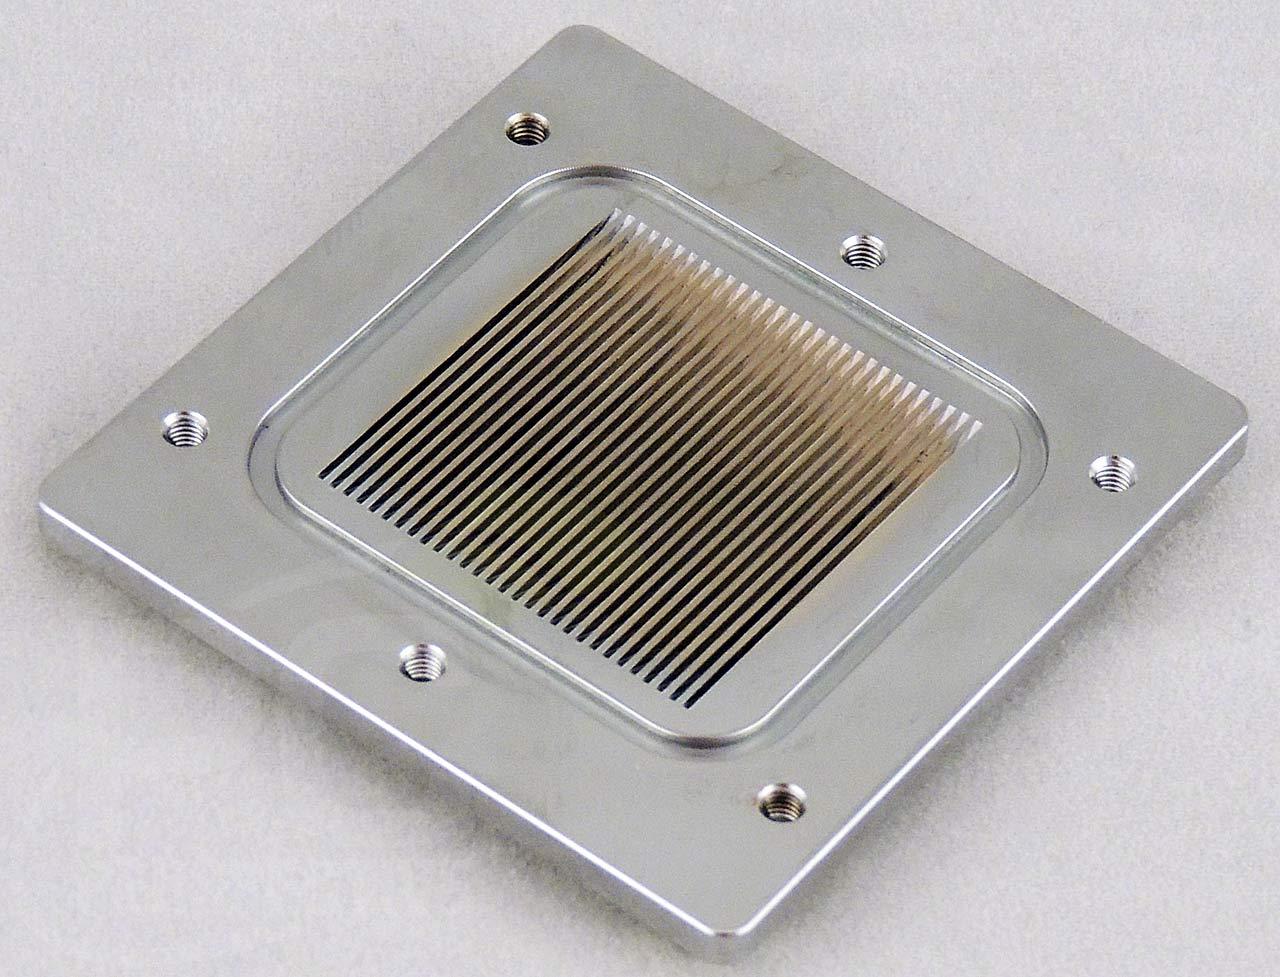 11-chipset-block-coolerplate-top-1.jpg